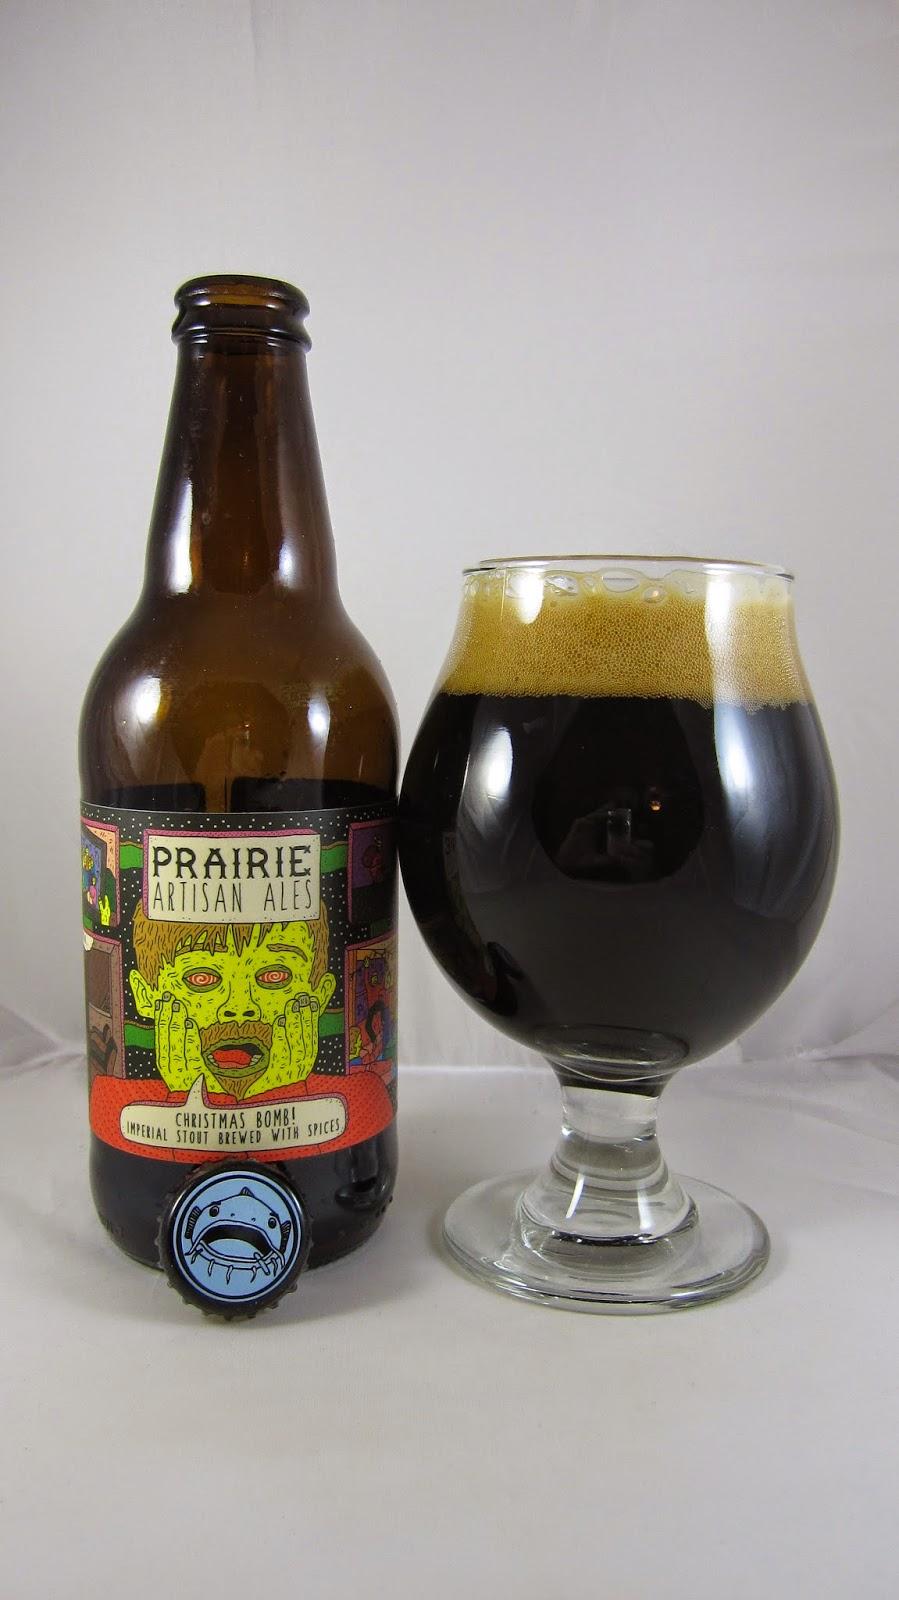 Chad'z Beer Reviews: Prairie Christmas Bomb!